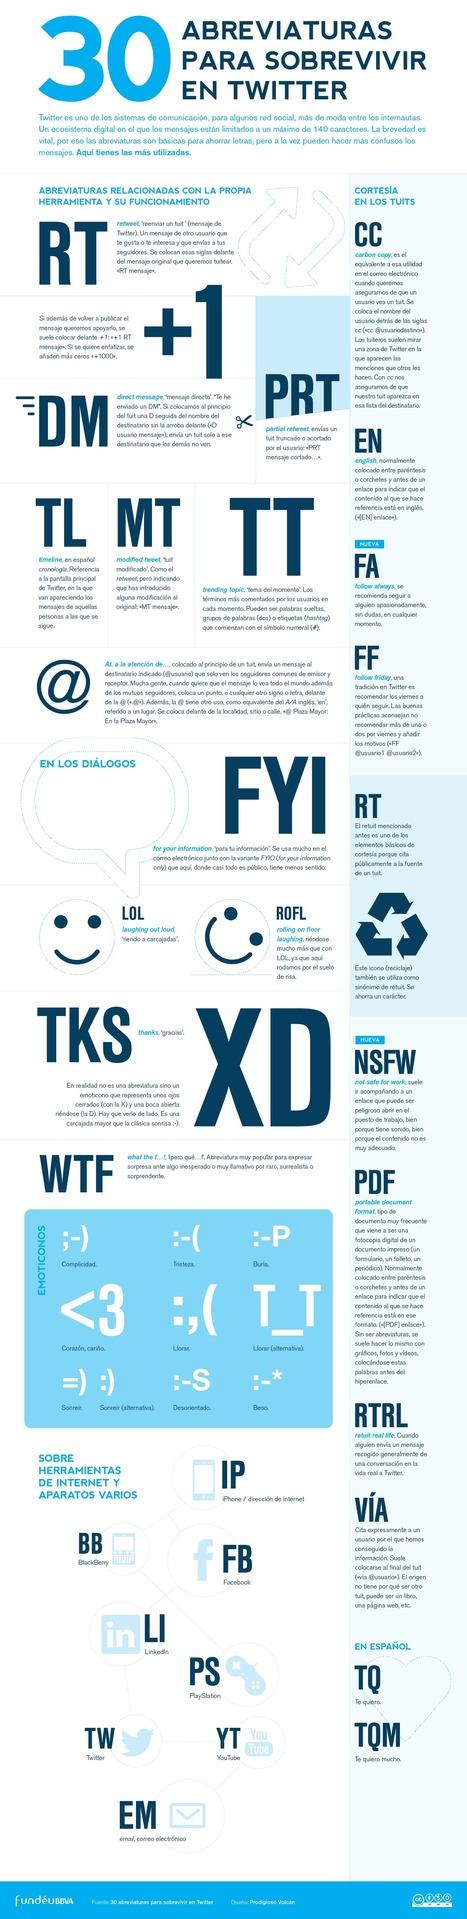 30 abreviaturas para sobrevivir en Twitter | Sinapsisele 3.0 | Scoop.it